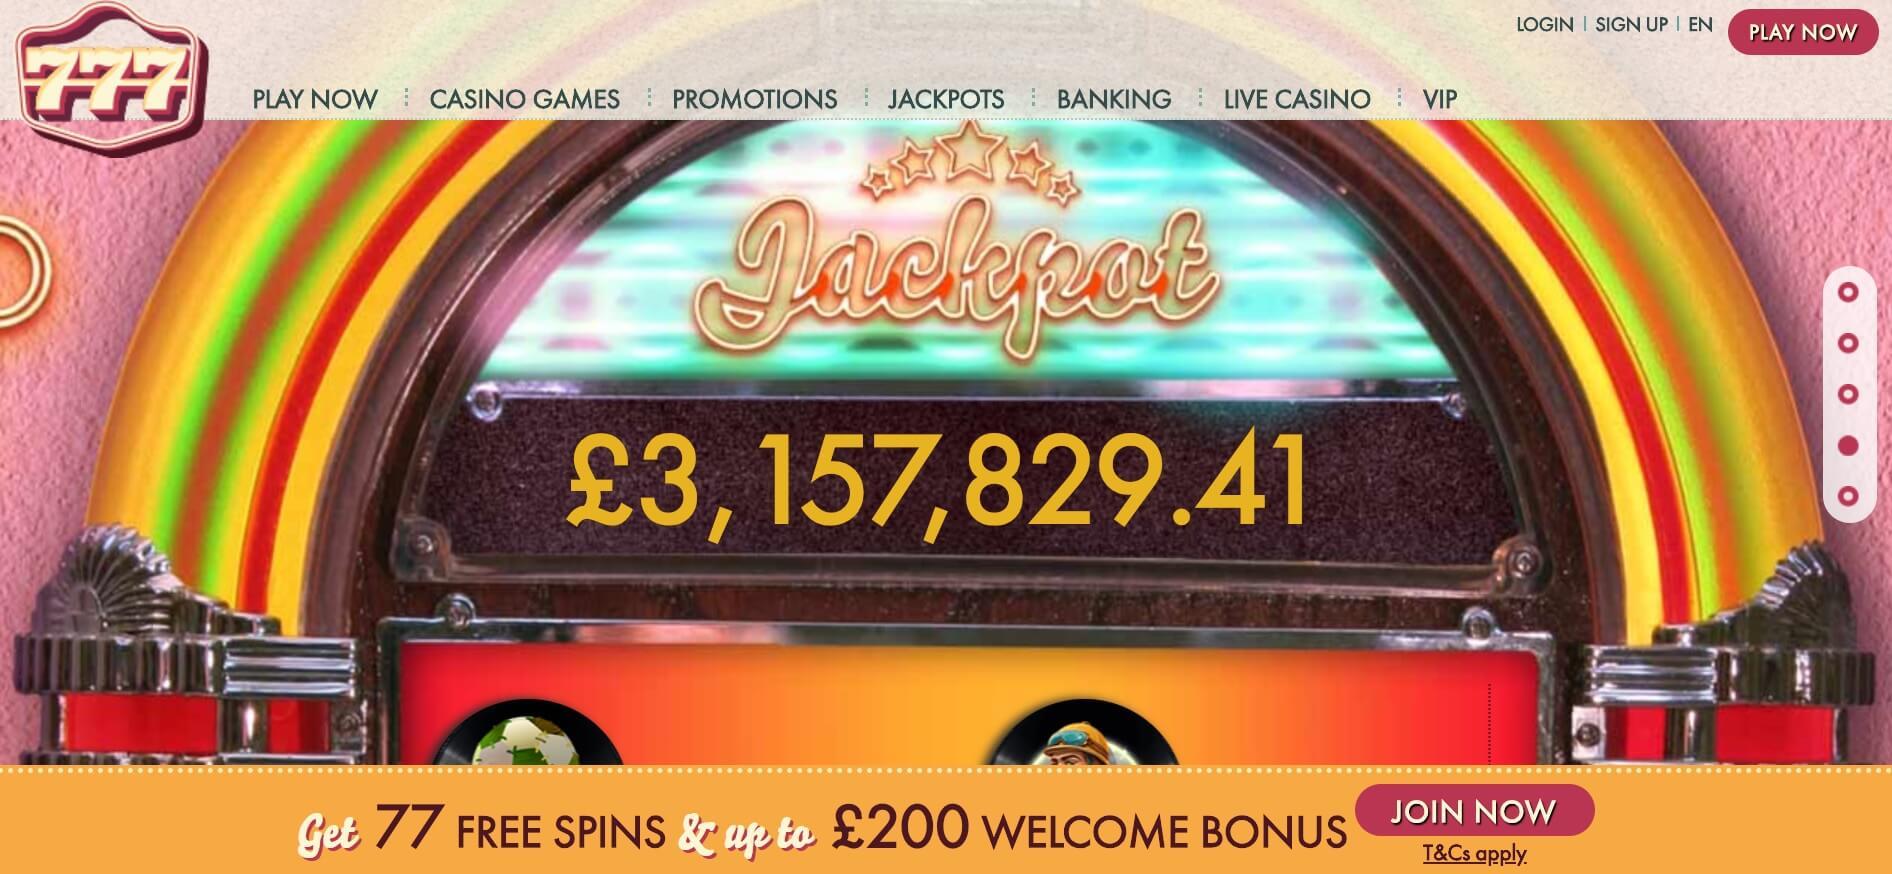 Dreams casino no deposit bonus 2020